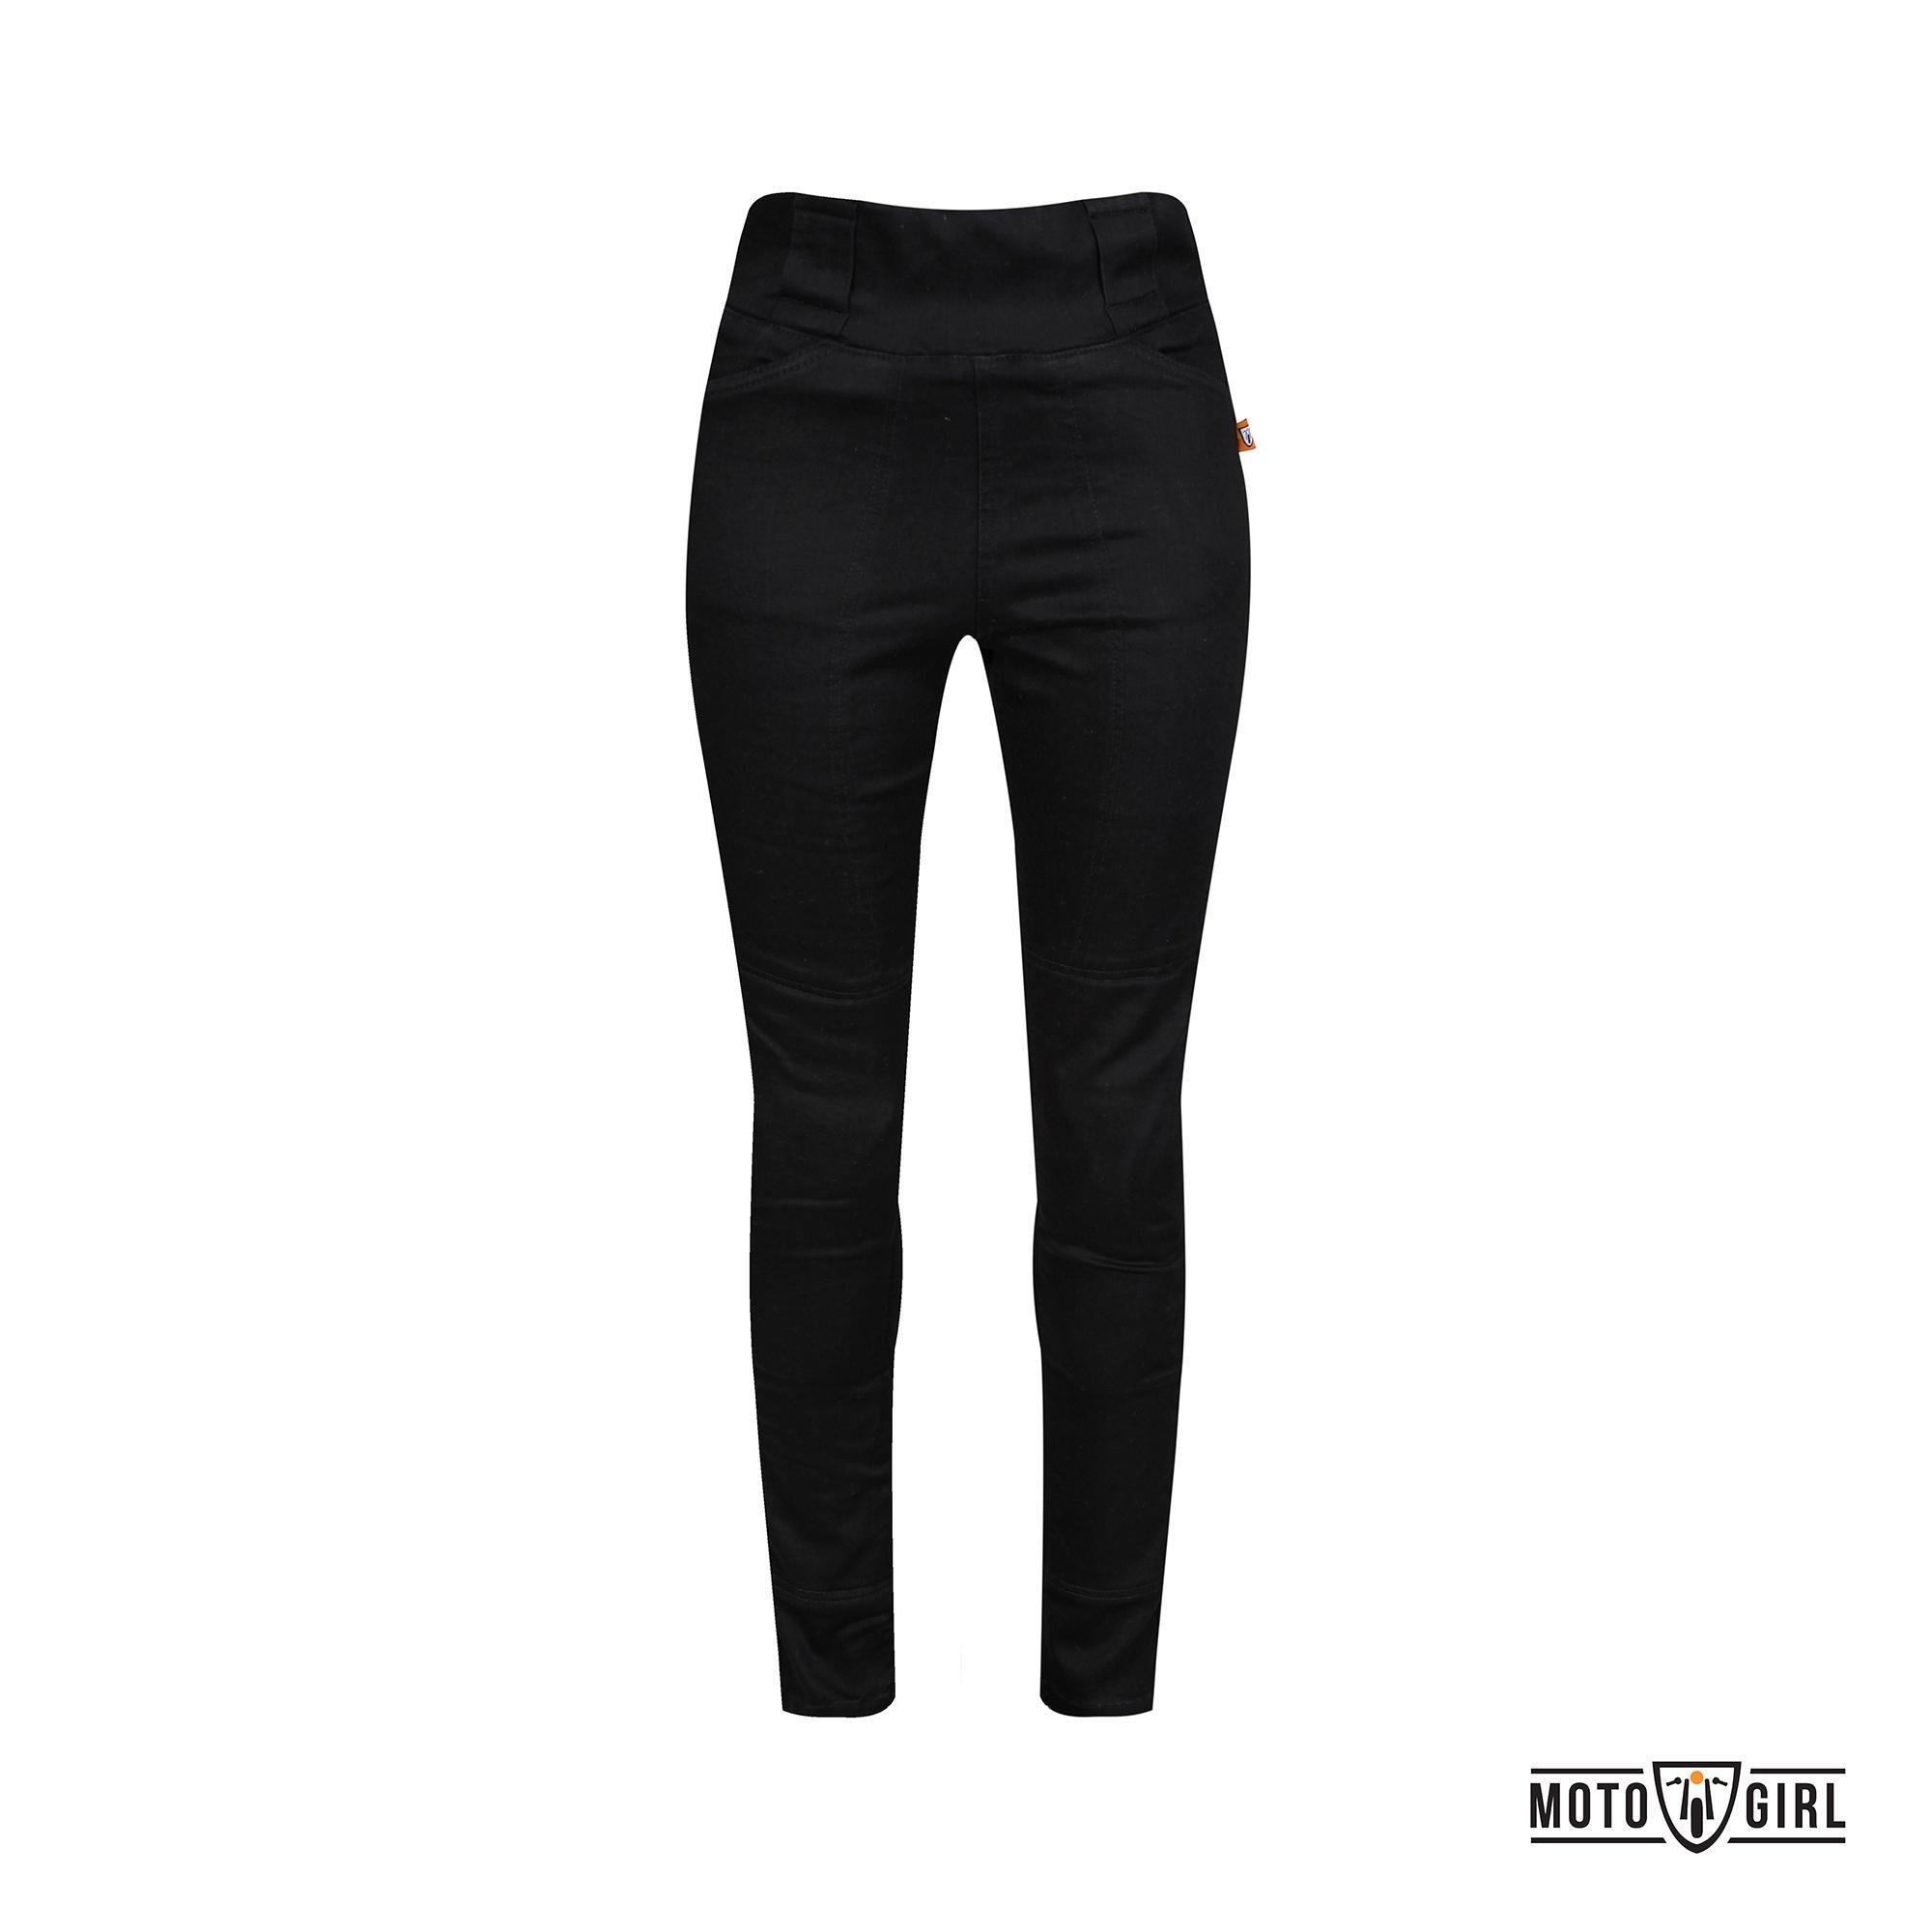 Pantaloni Motogirl - Melissa Jeggings Nero